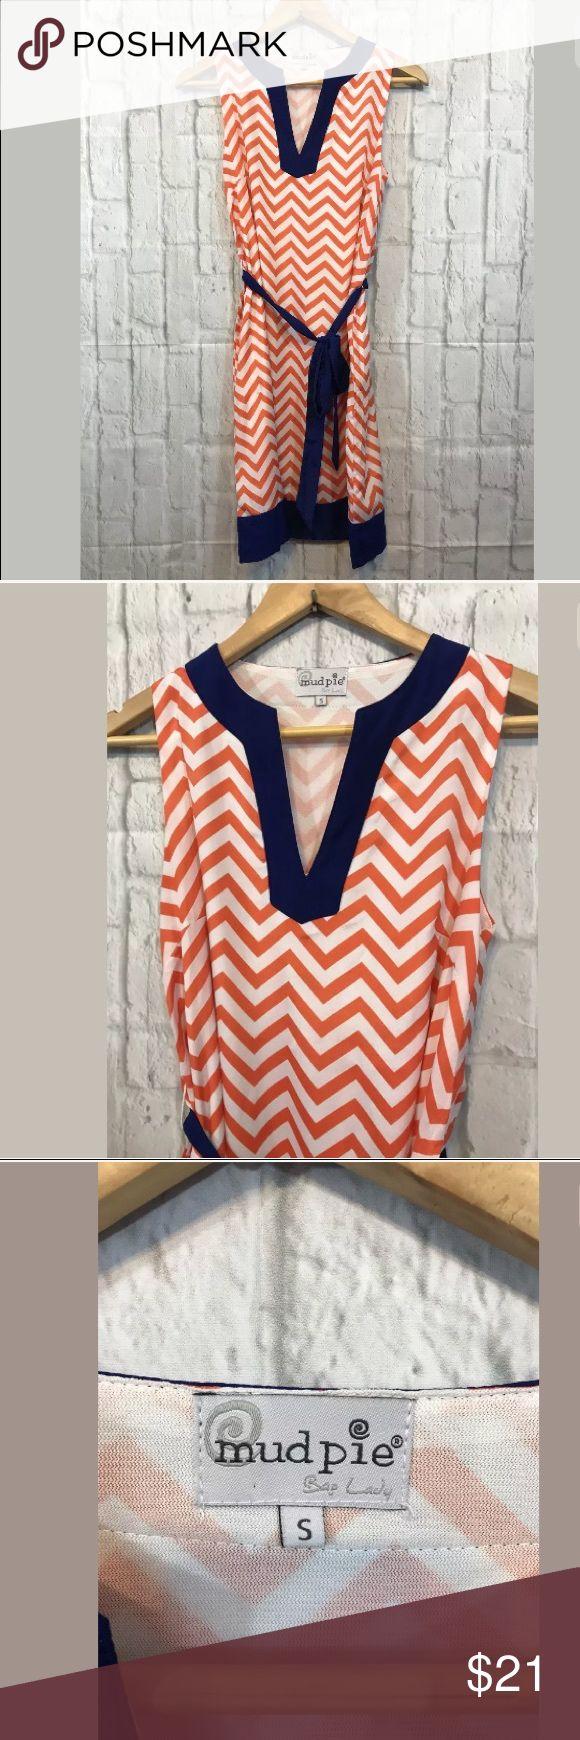 Mud Pie Dress Mud Pie Dress Orange White Blue Chevron Sleeveless Sundress Size S Mud Pie Dresses